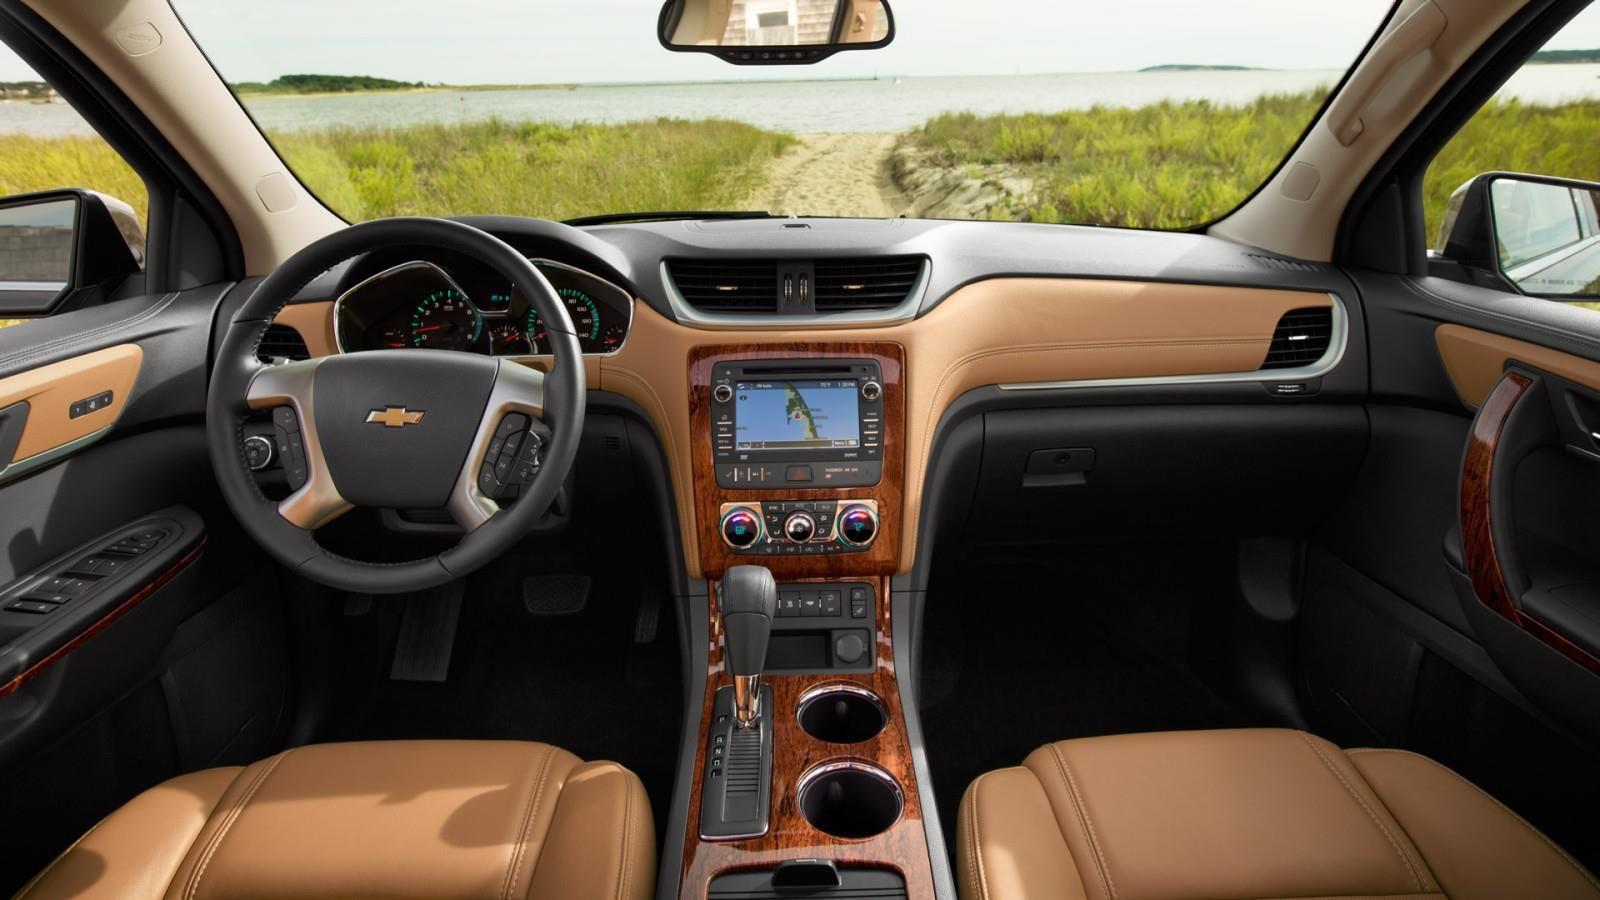 Chevrolet Traverse Chevrolet traverse, Chevrolet